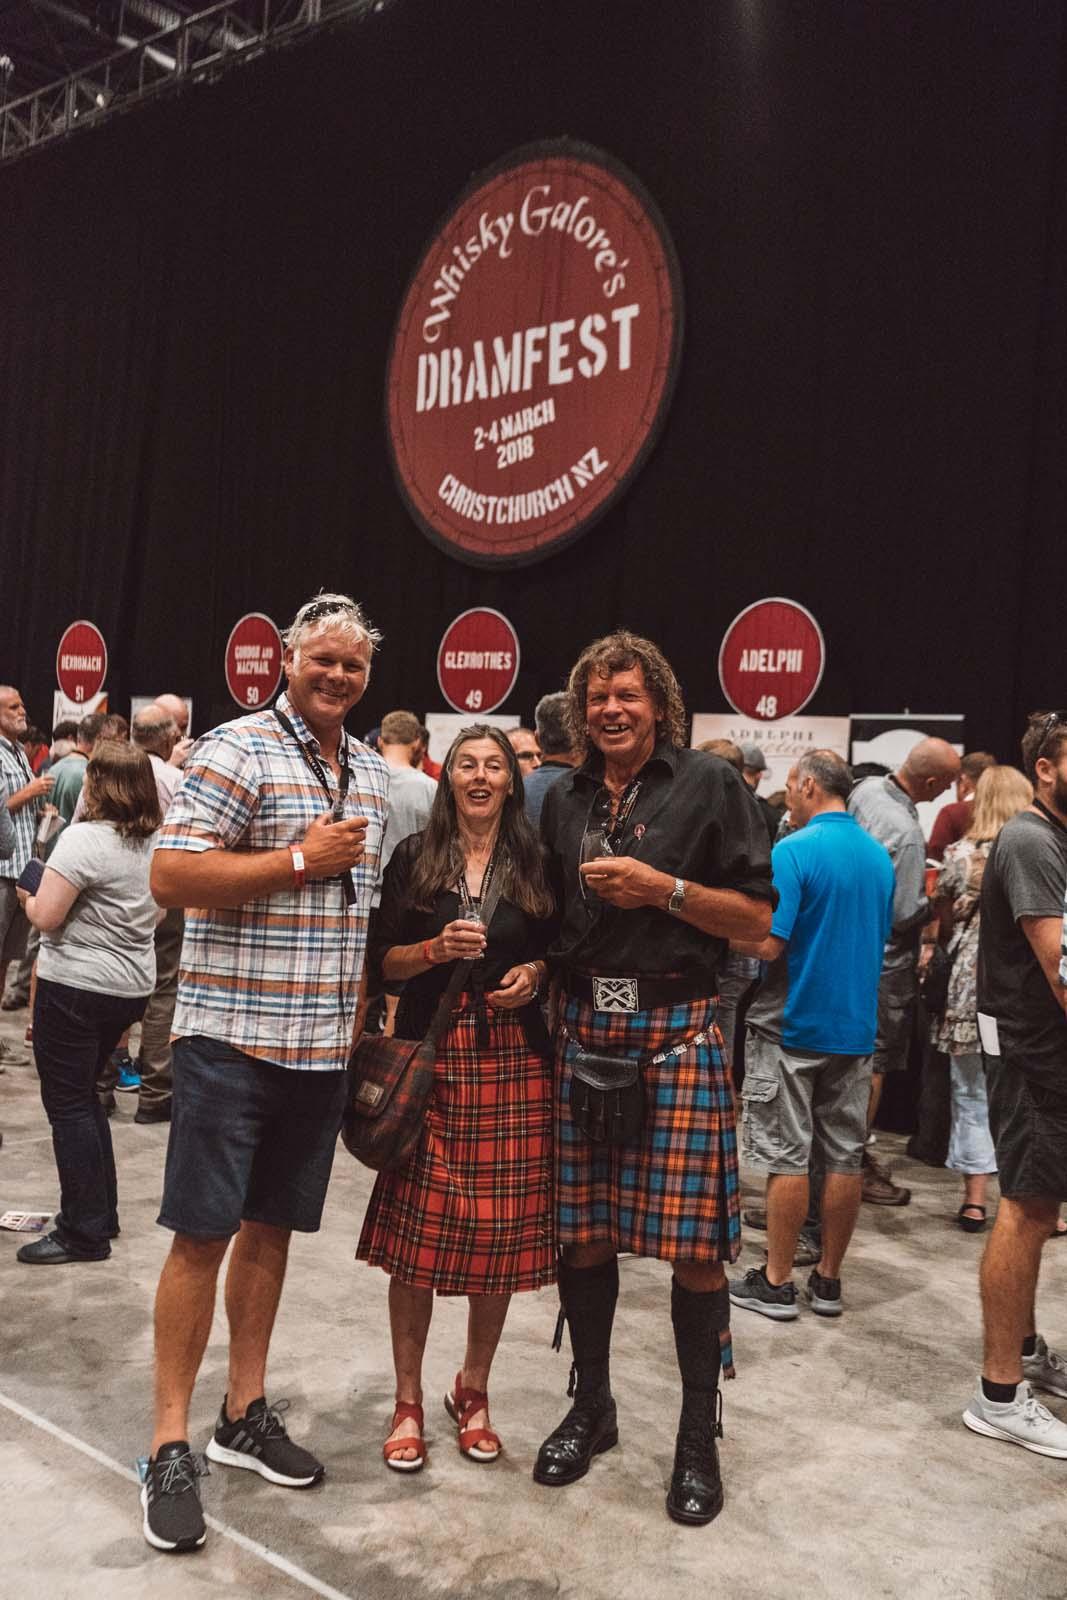 Dramfest 2018 for Whisky Galore-337.jpg